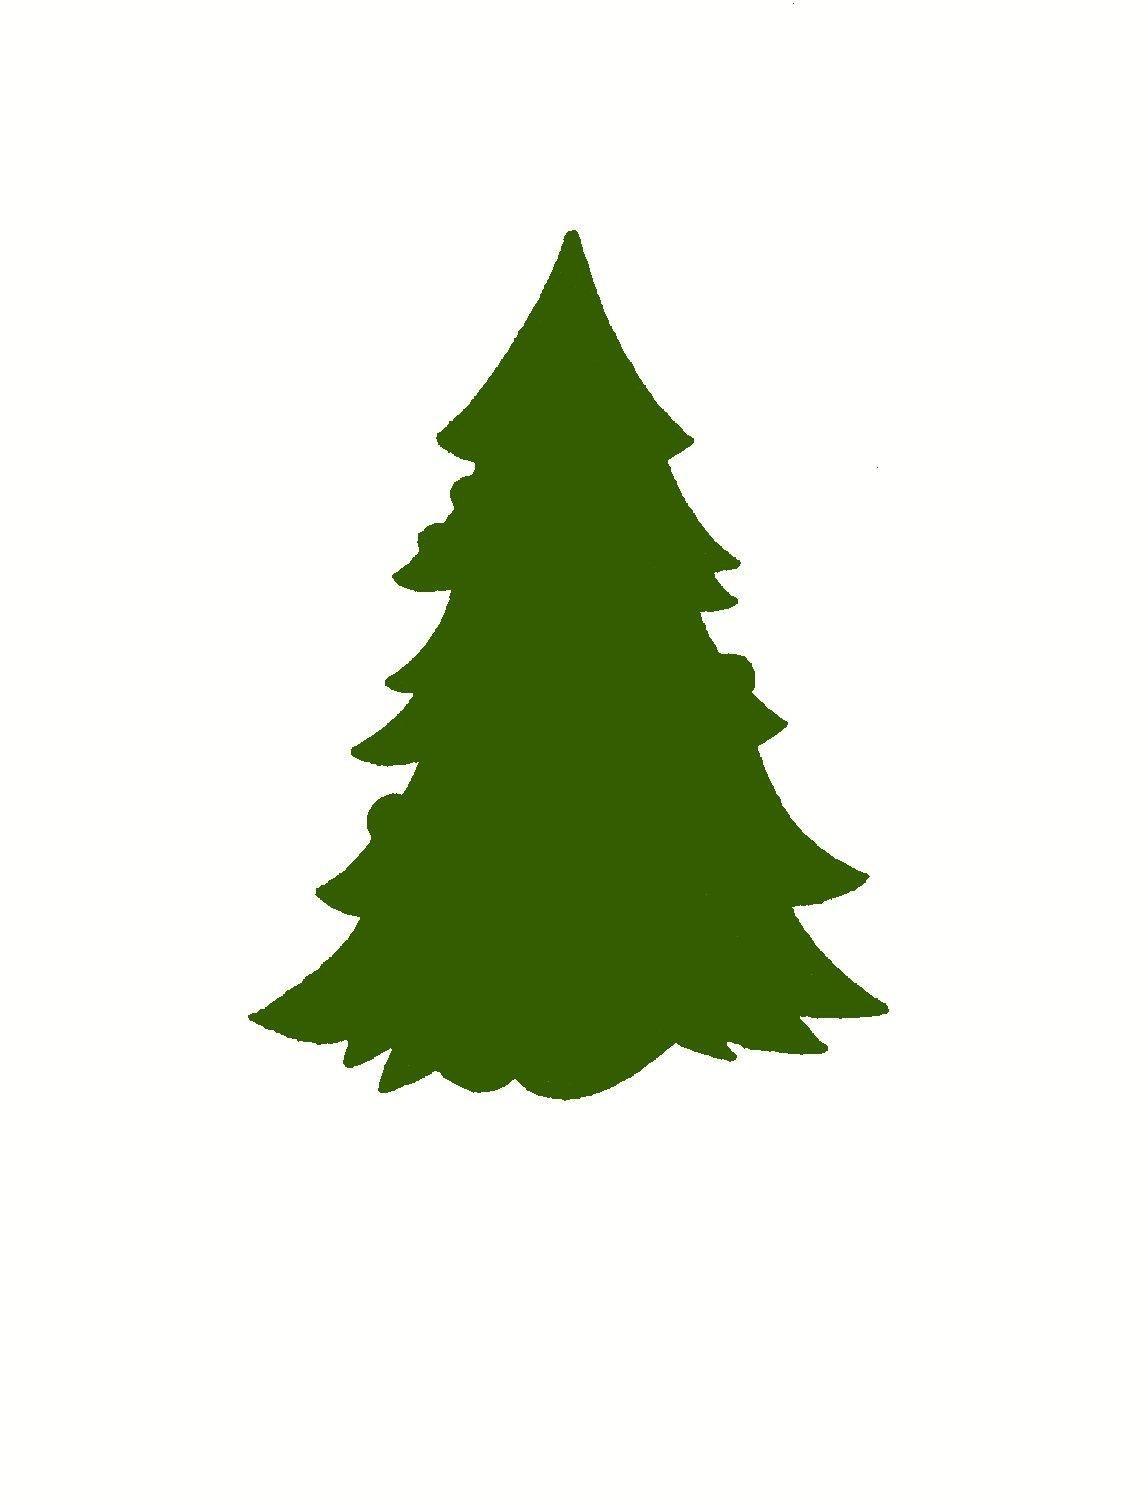 1148x1505 Photos Pine Tree Clip Art Silhouette,